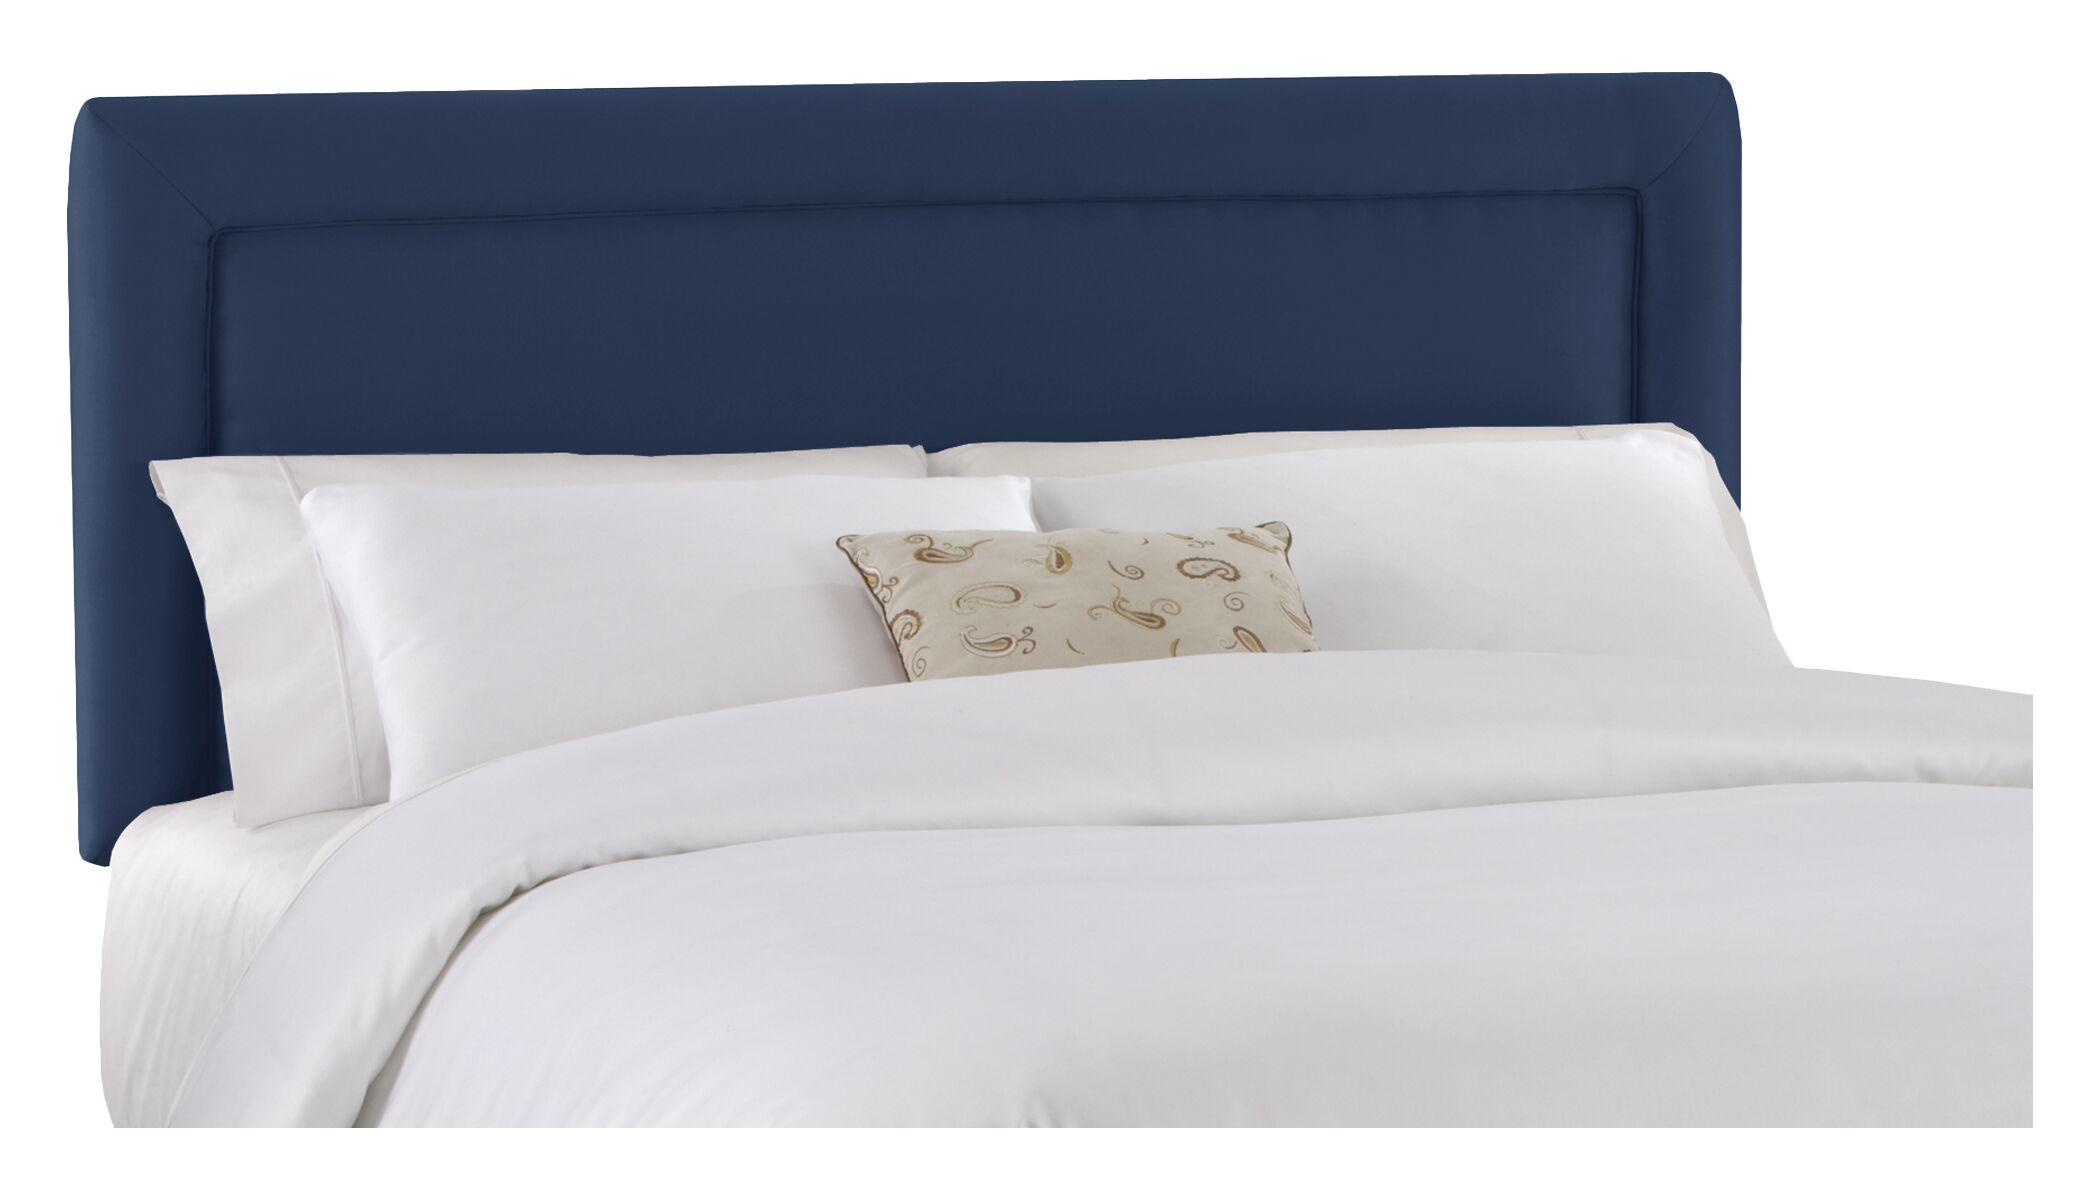 Border Upholstered Panel Headboard Size: California King, Color: Lazuli